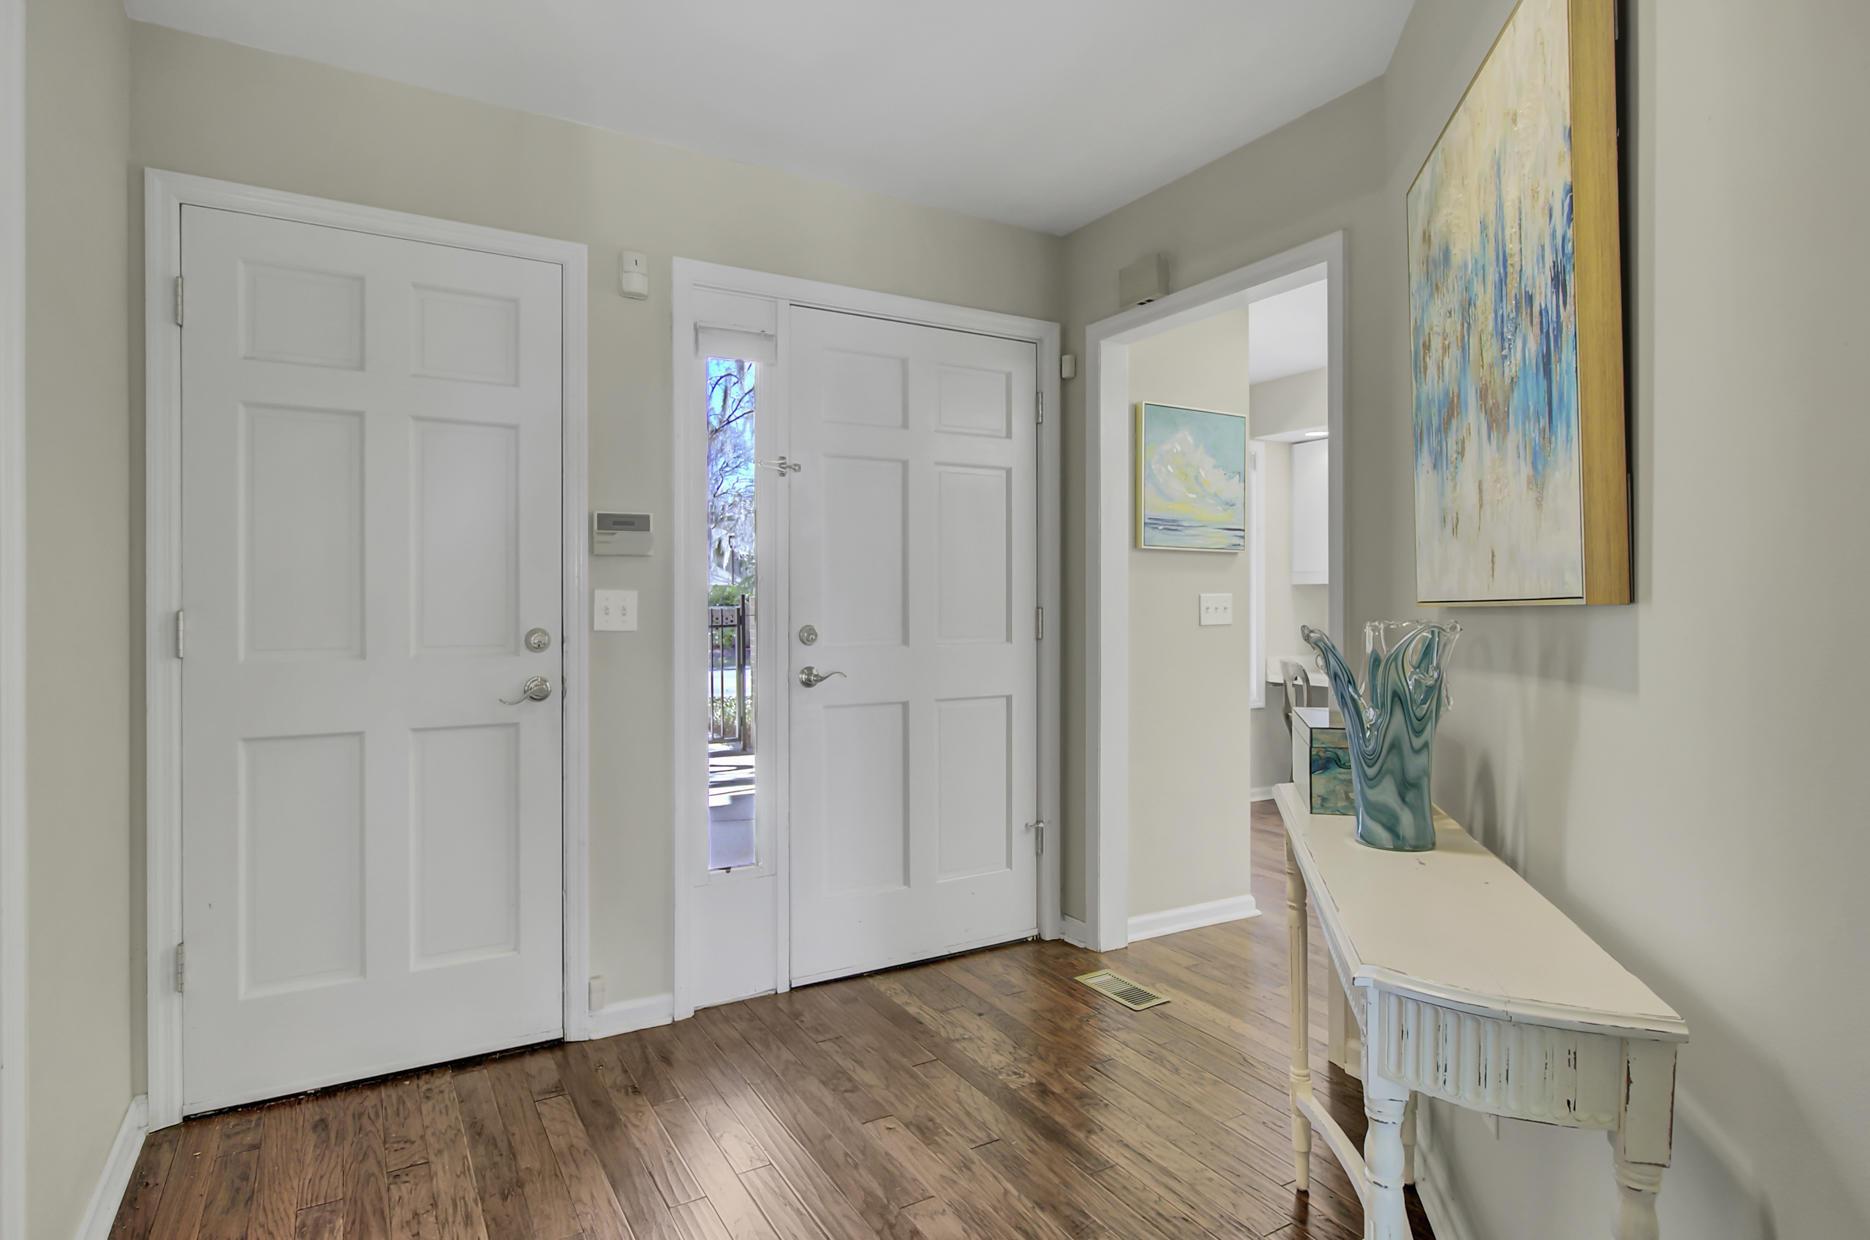 Wappoo Creek Place Homes For Sale - 29 Wappoo Creek, Charleston, SC - 32